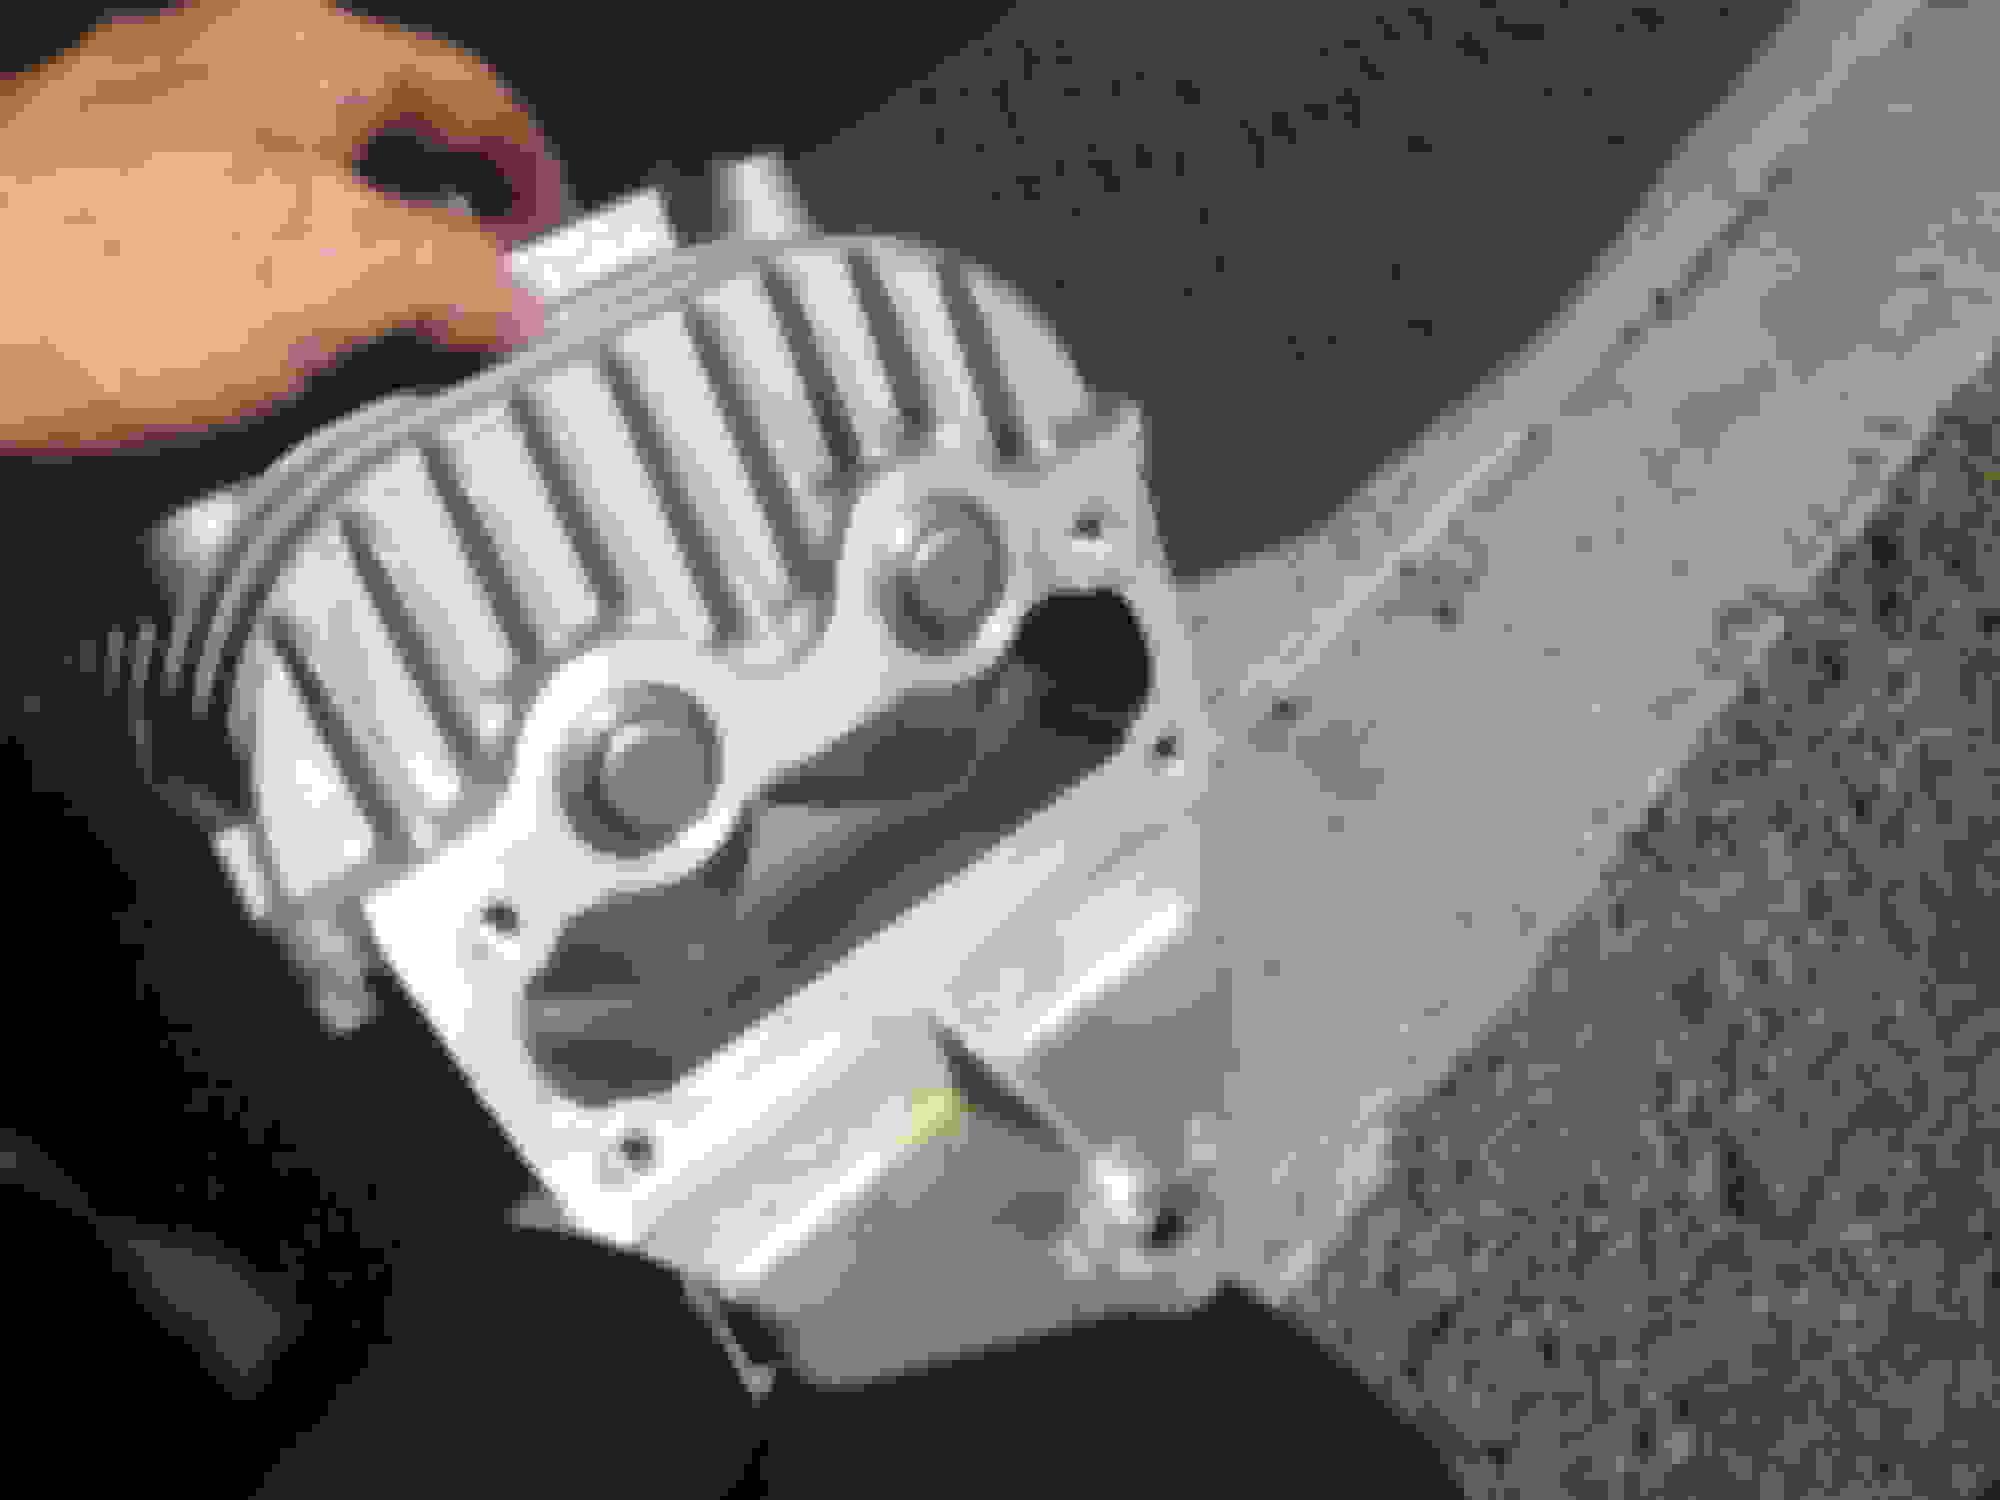 Eaton 112 Gen IV Rear Needle bearing Replacement - Jaguar